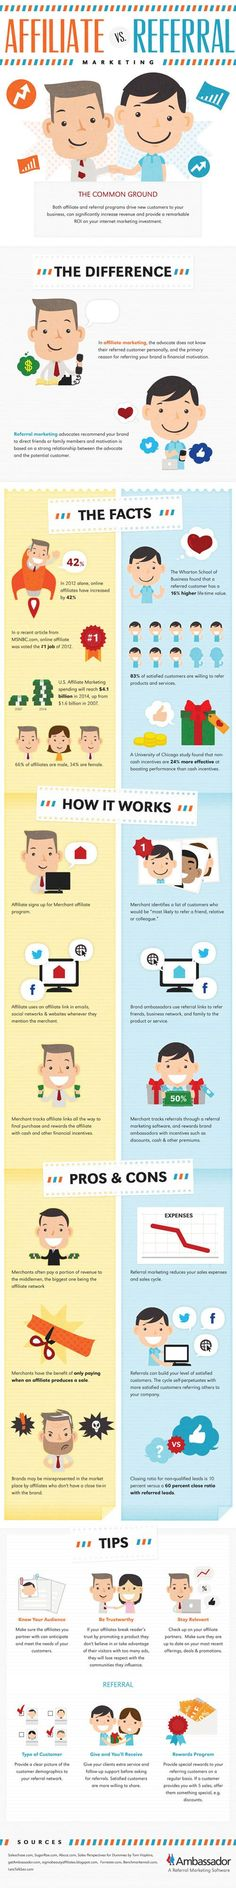 Affiliate Marketing vs Referral Marketing